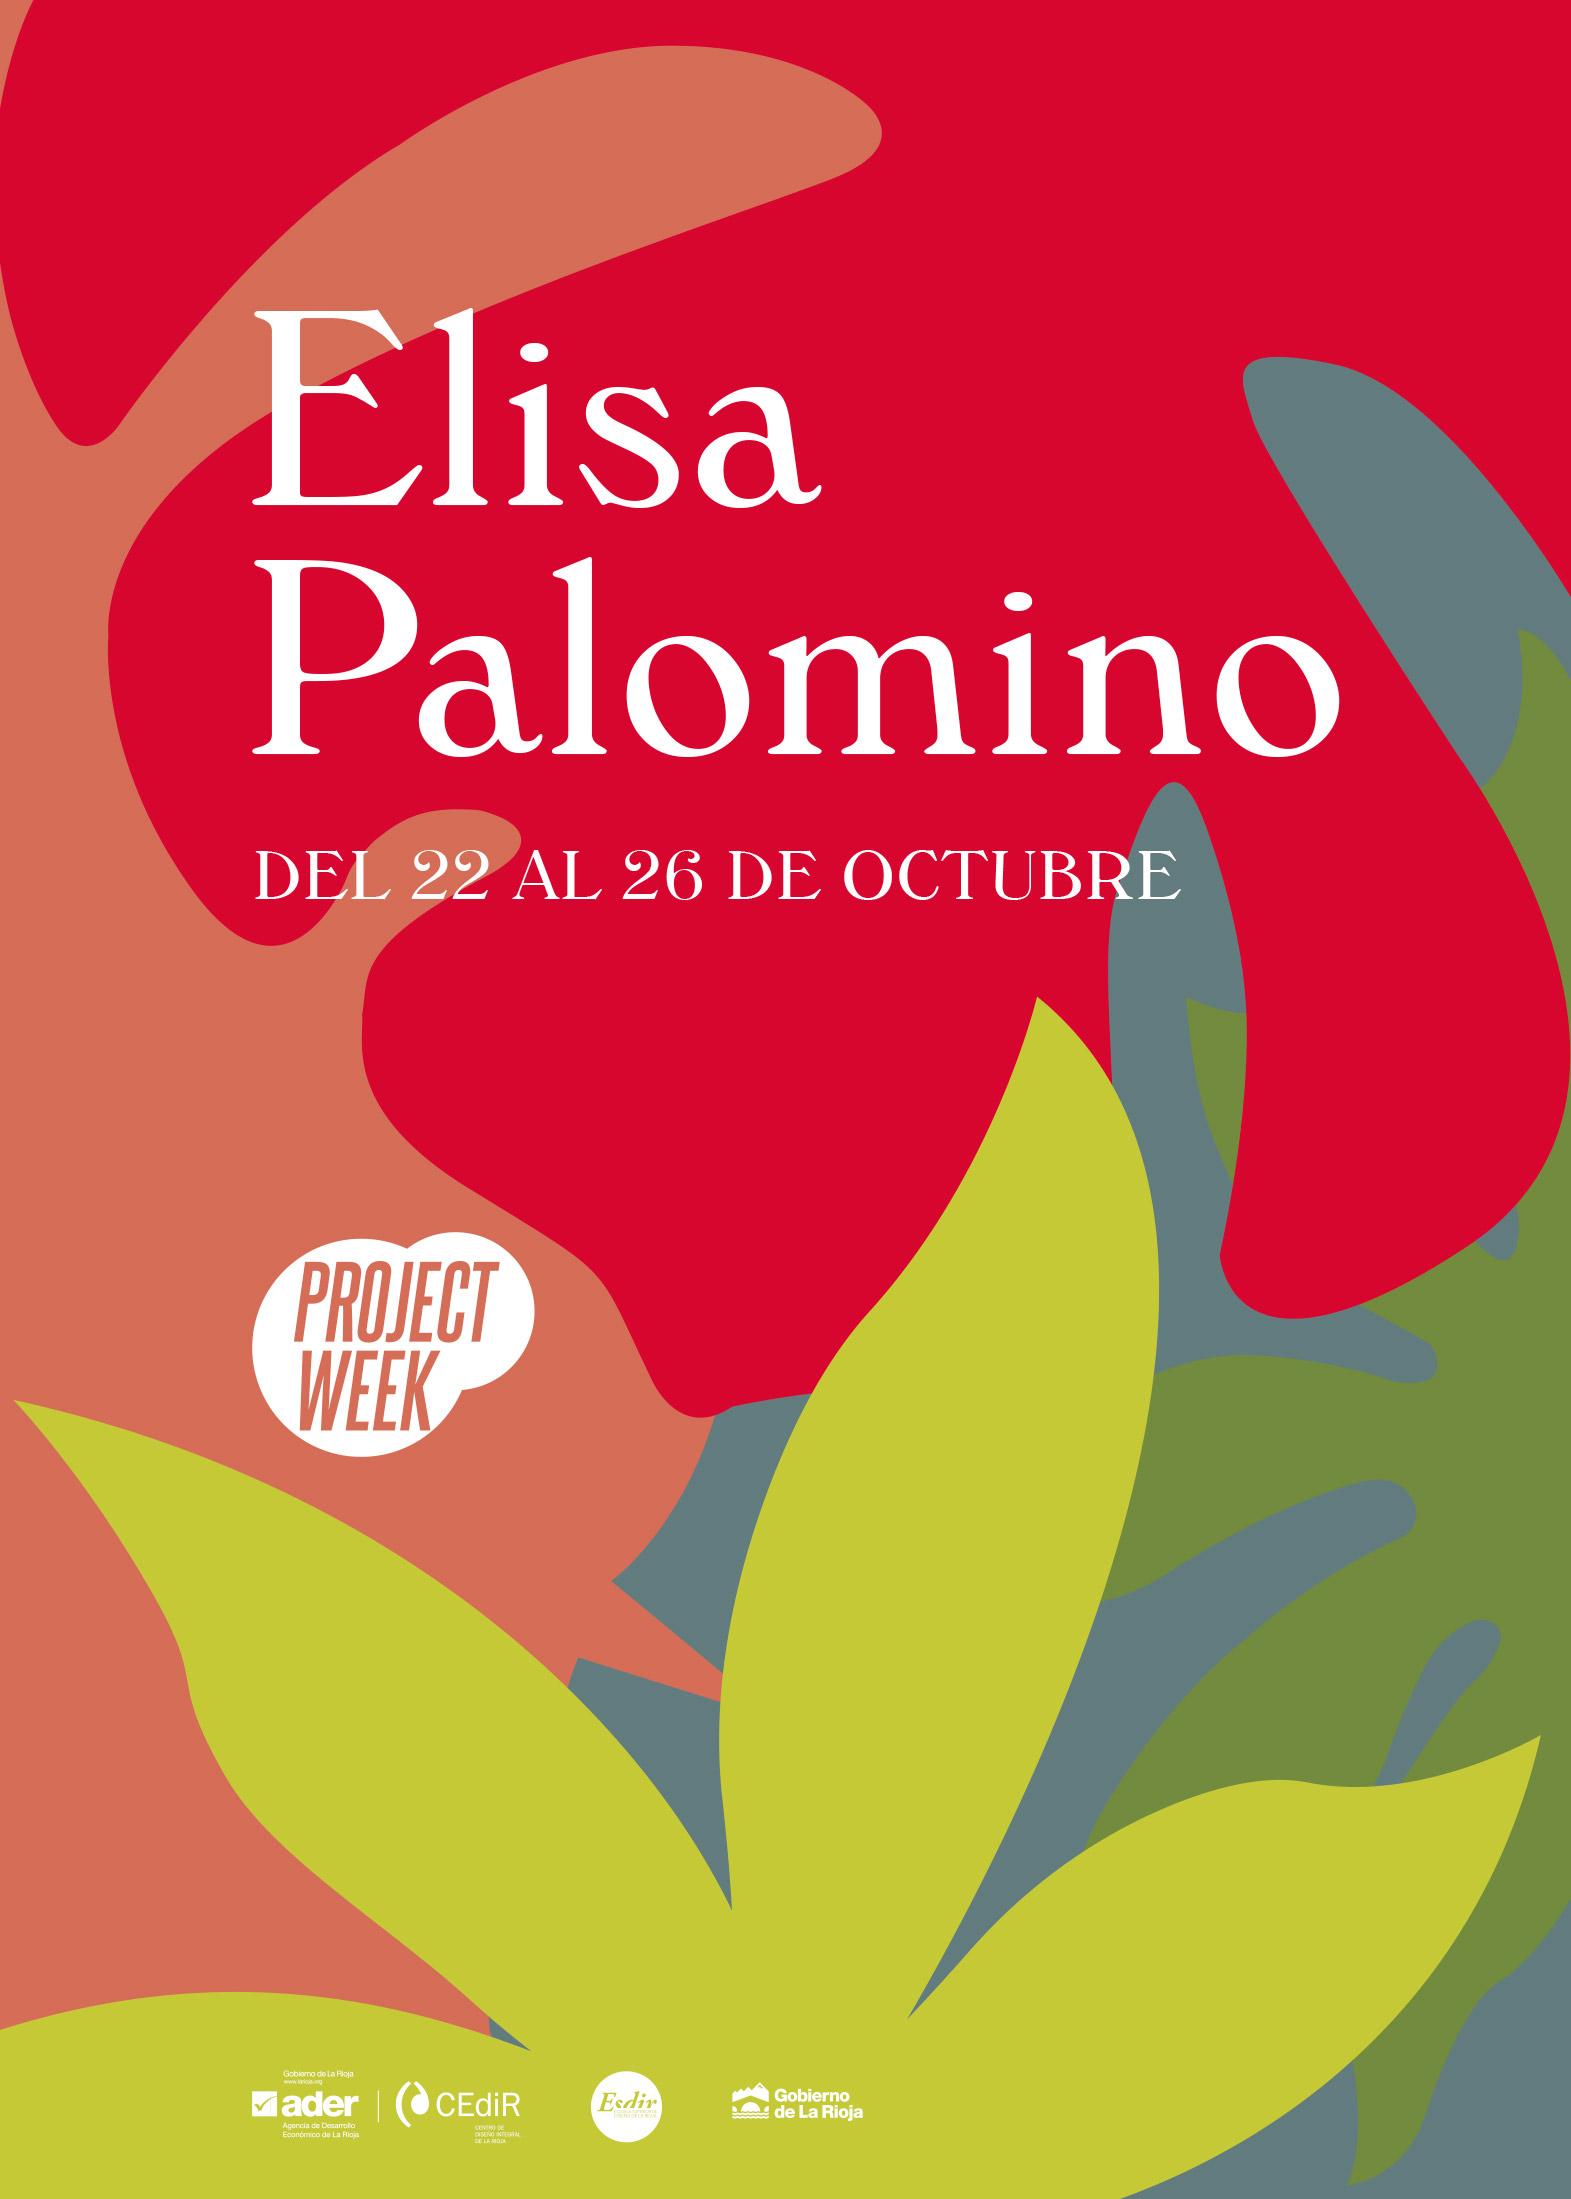 Project Week 9 con Elisa Palomino.